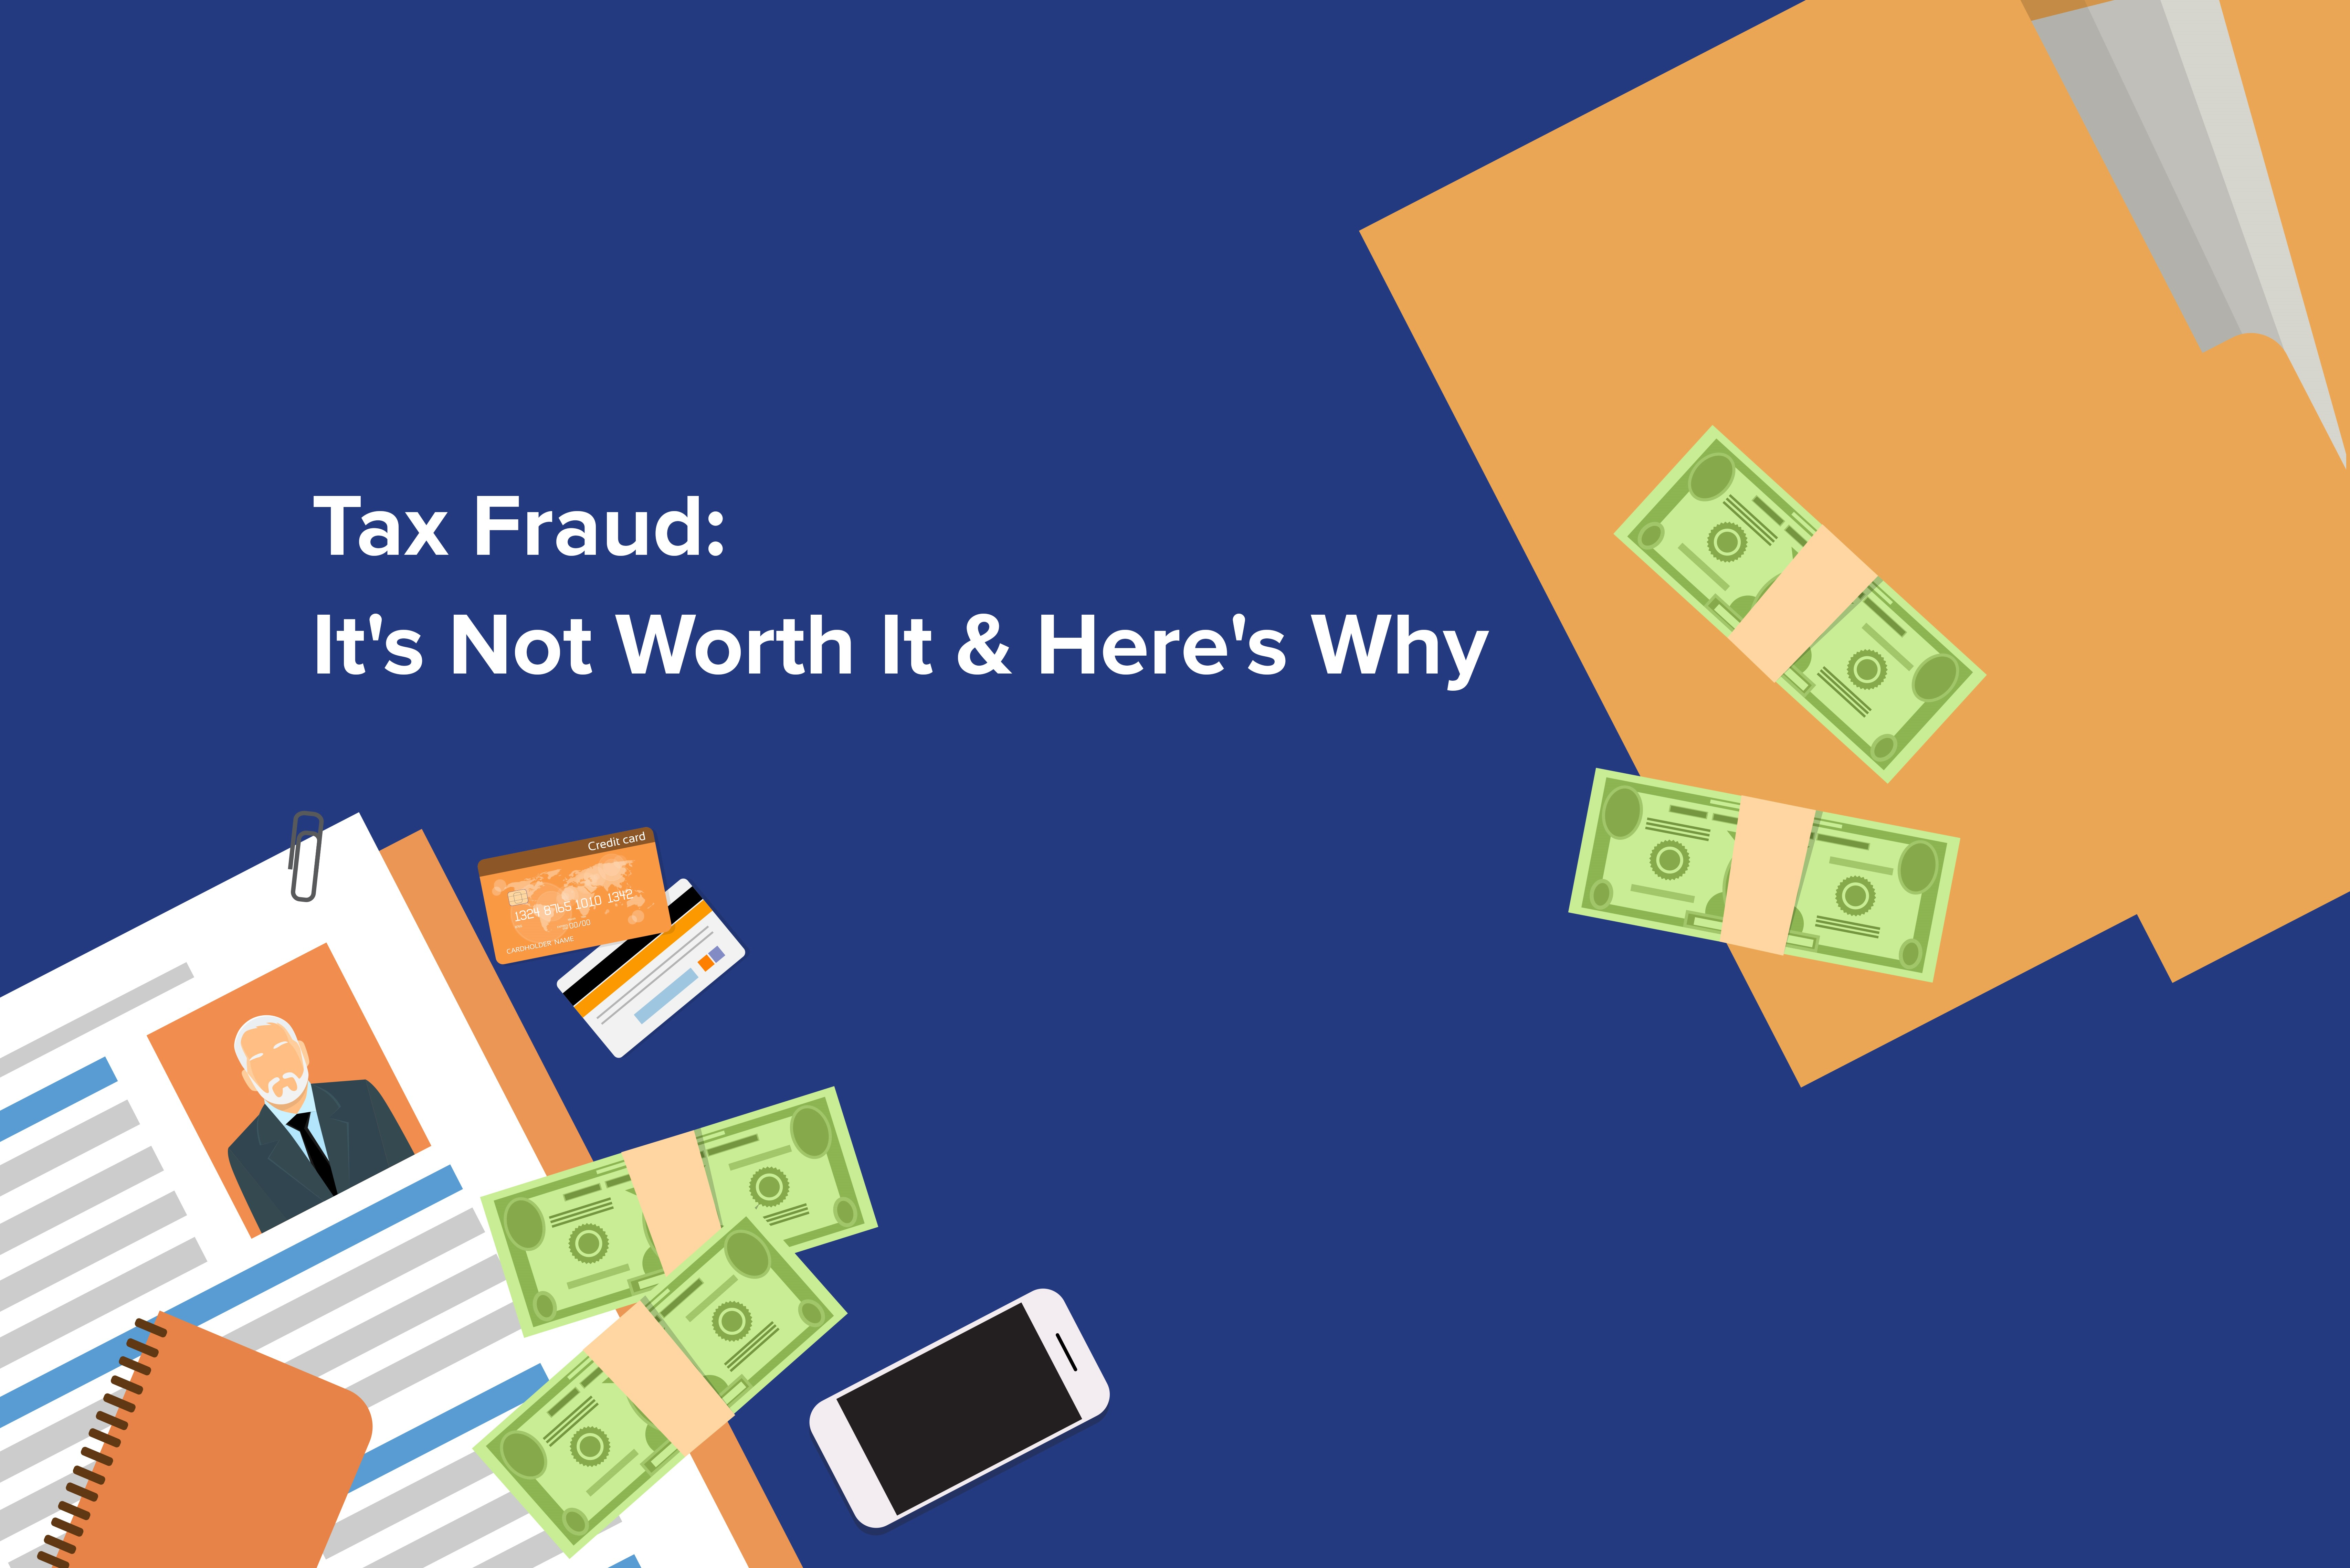 Tax Fraud: It's Not Worth It & Here's Why | Community Tax